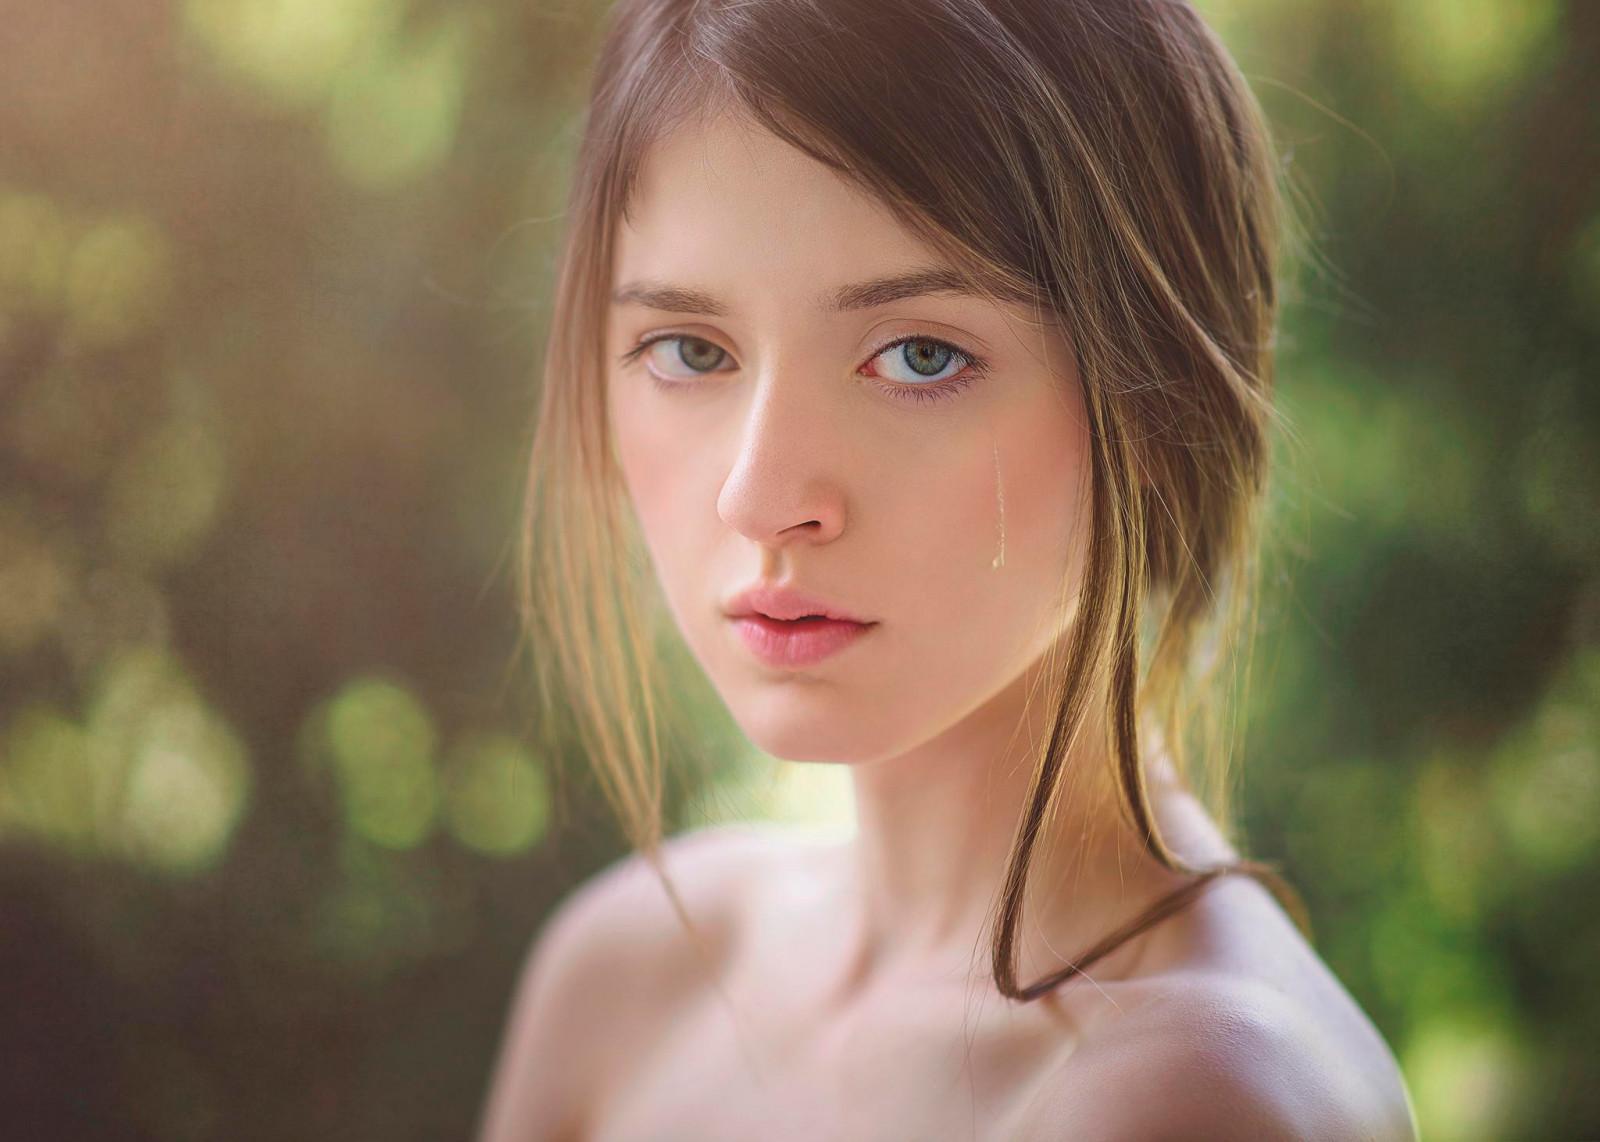 pictures-beautiful-teens-cutie-little-nude